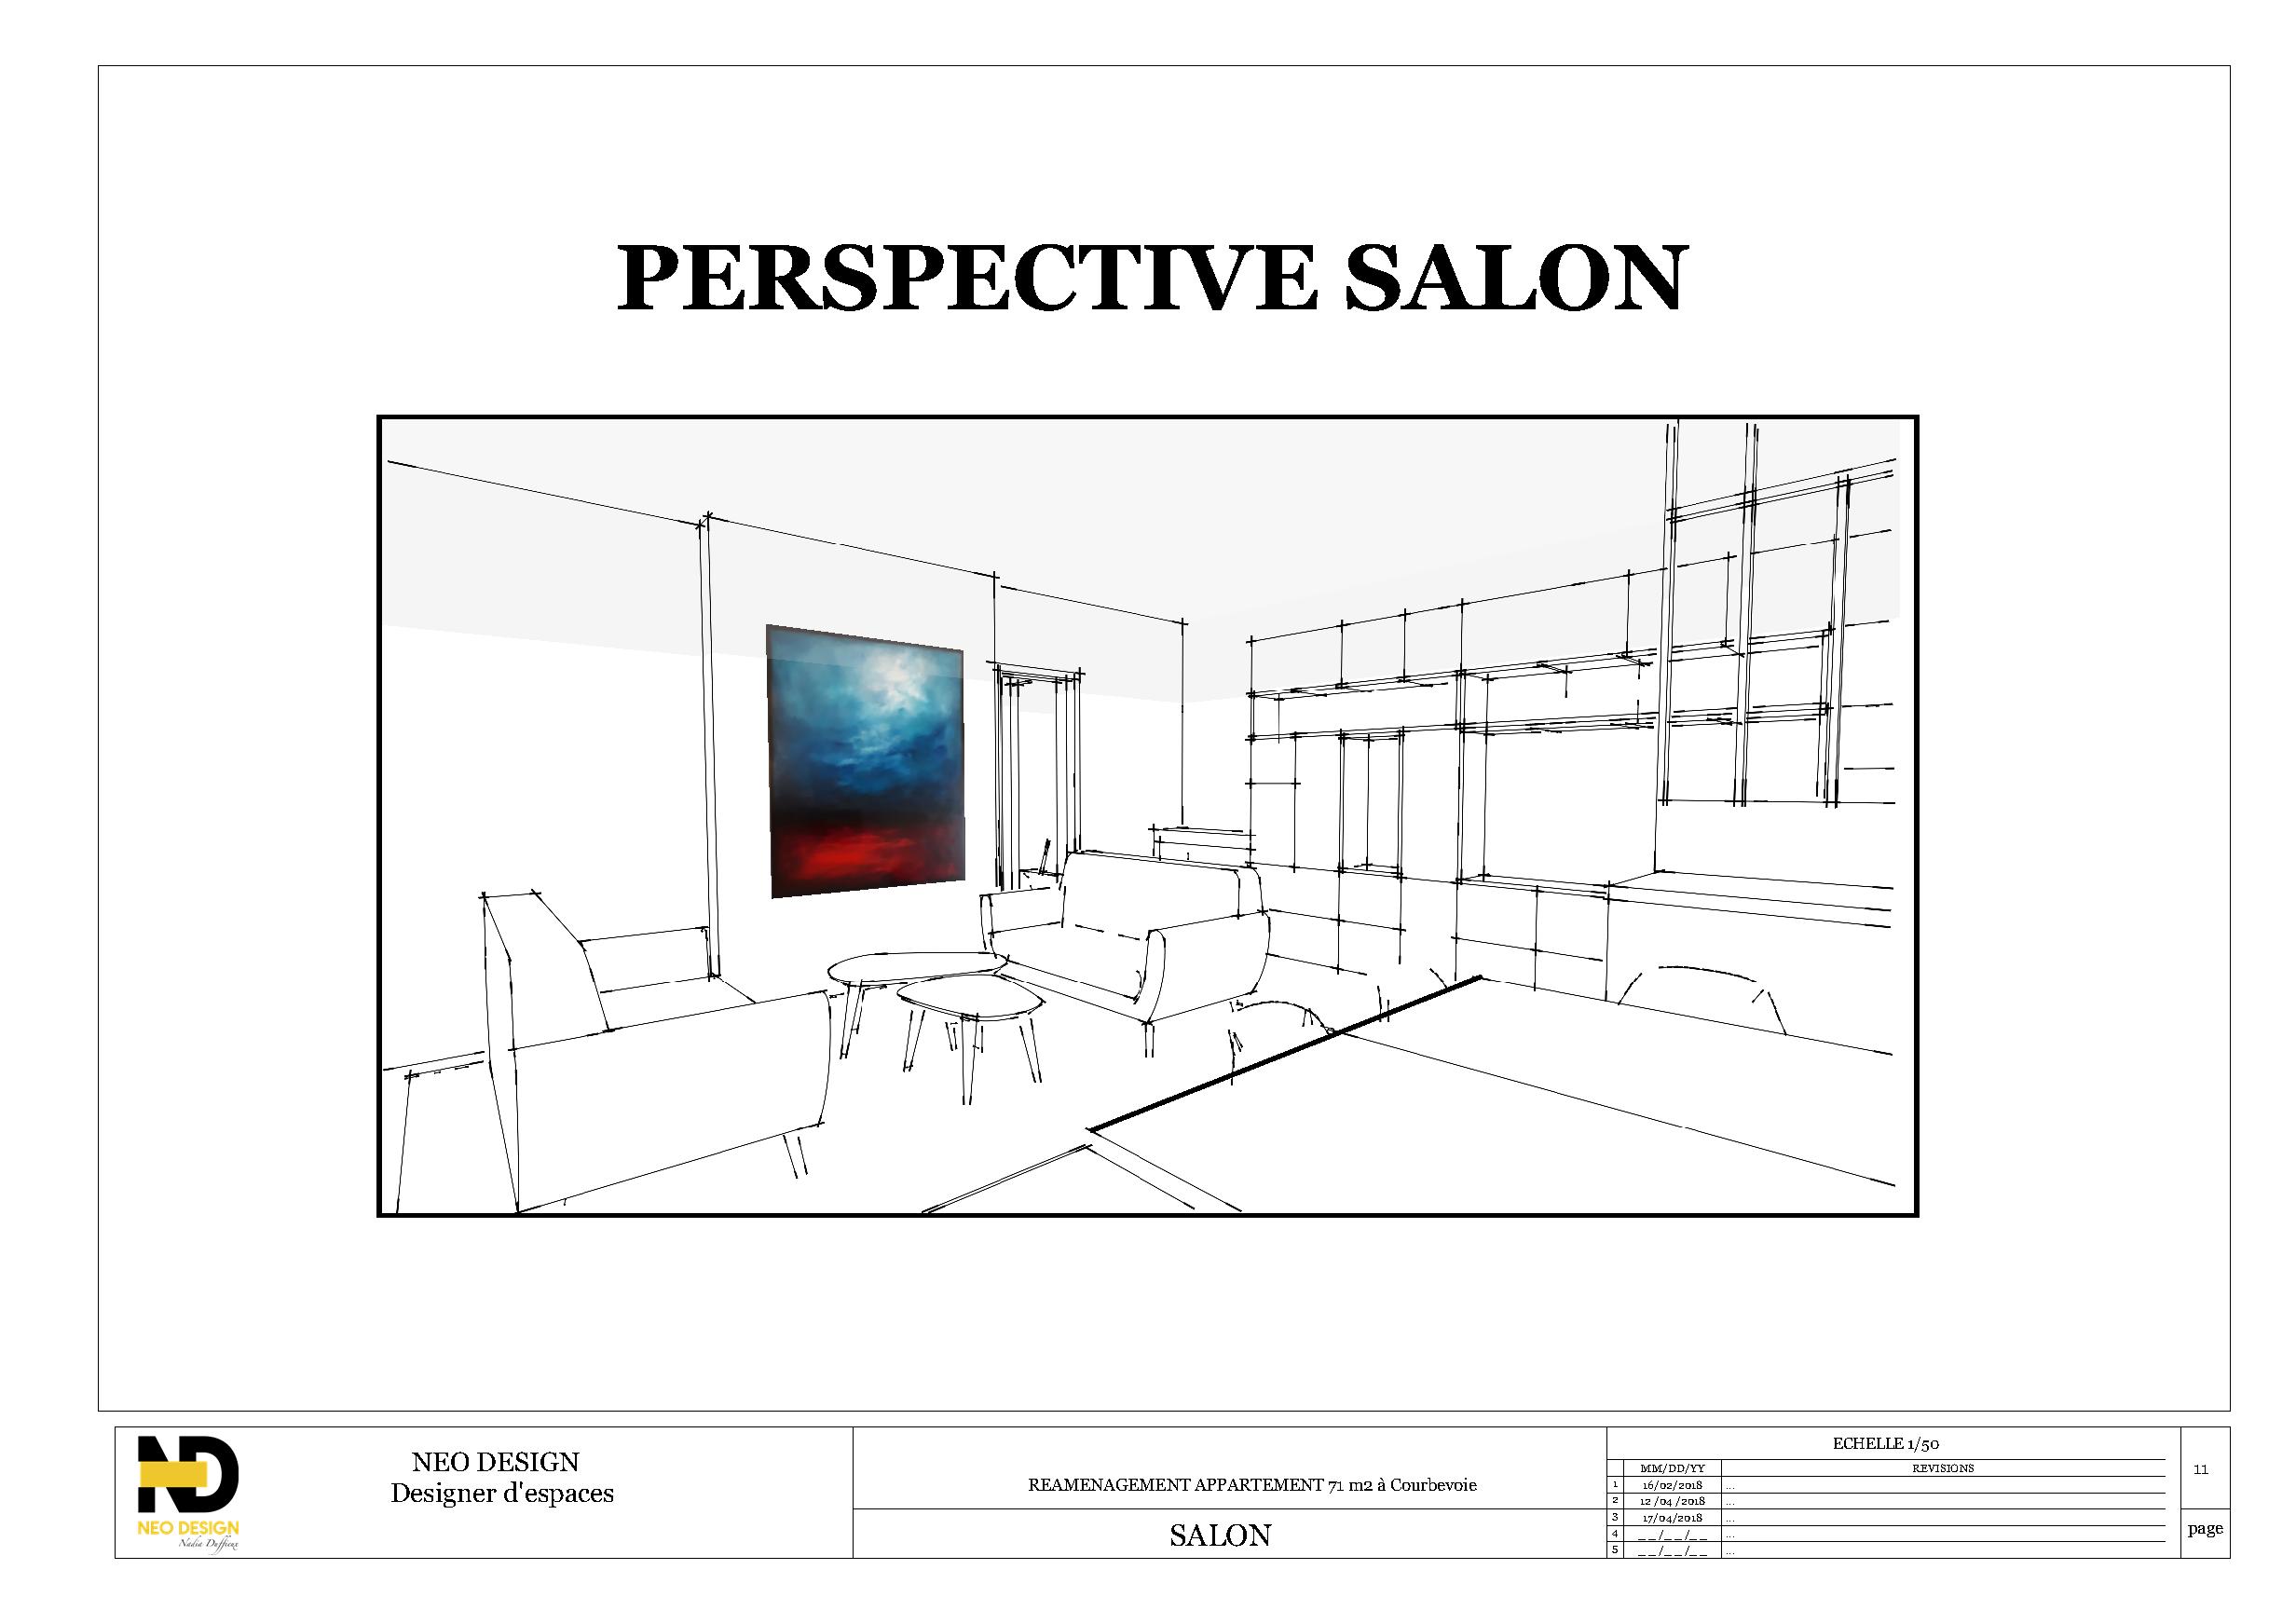 Perspective salon